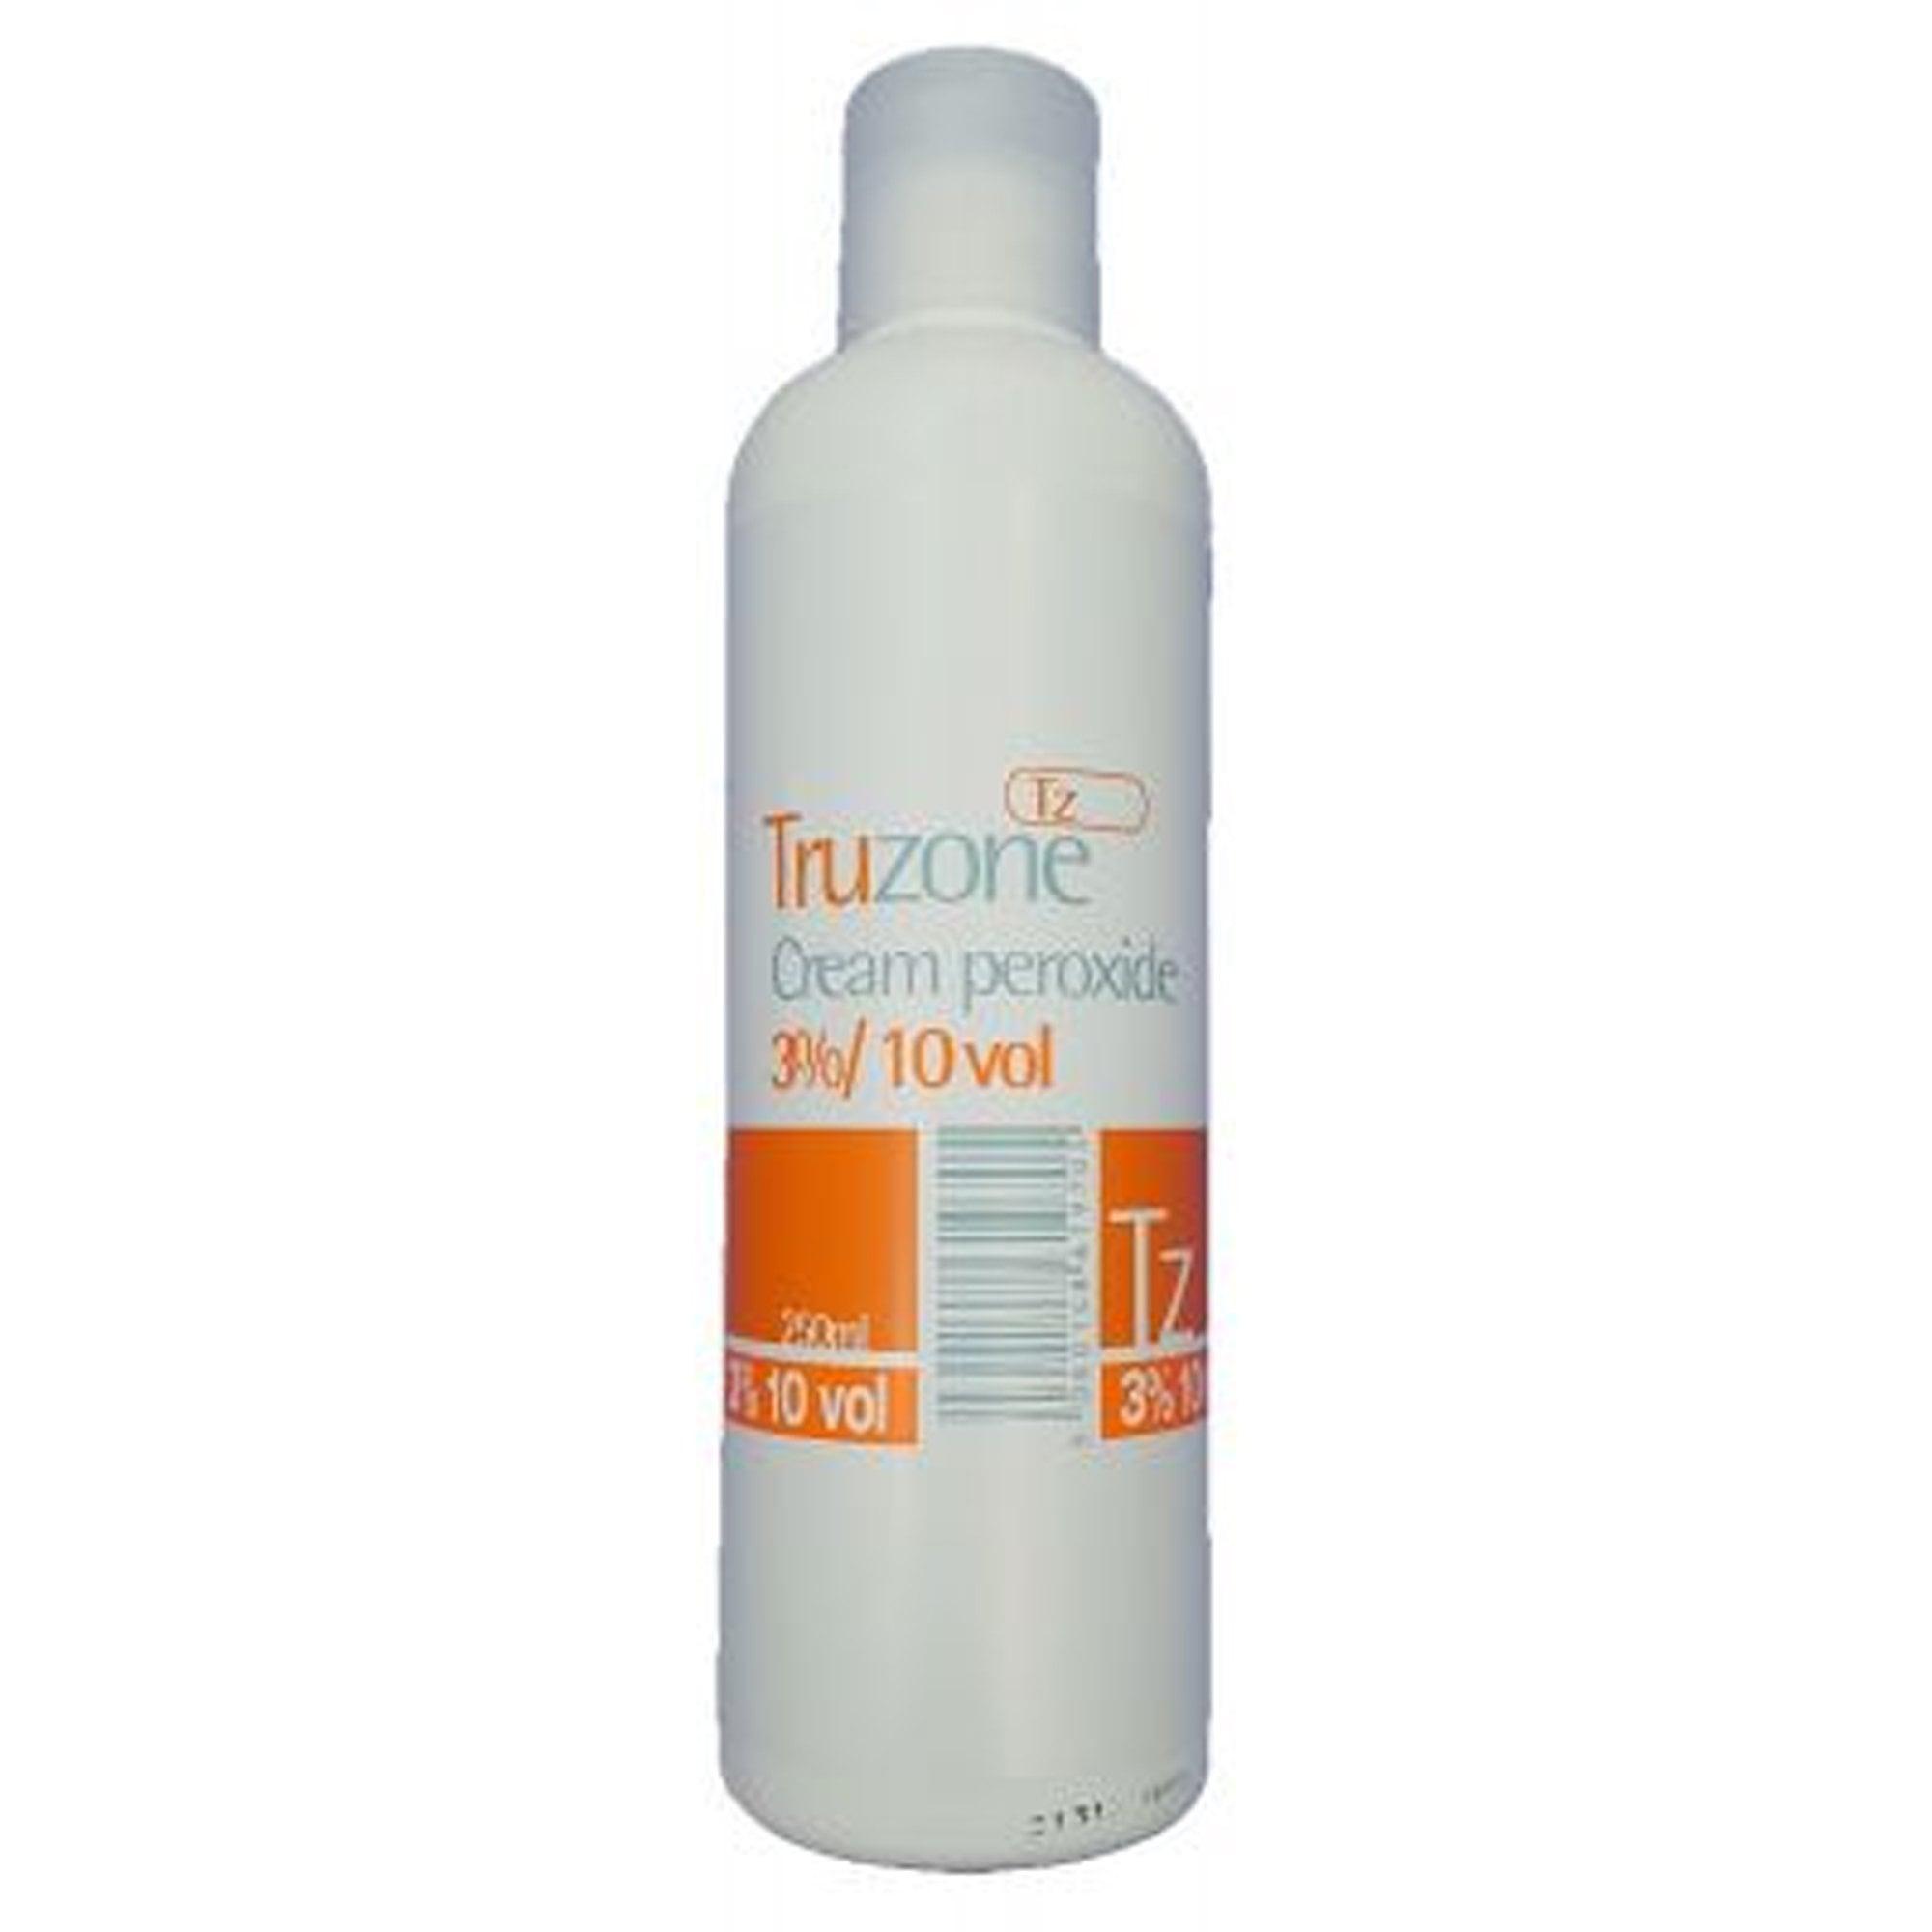 Truzone Cream Peroxide 3% 10 Vol - 250ml